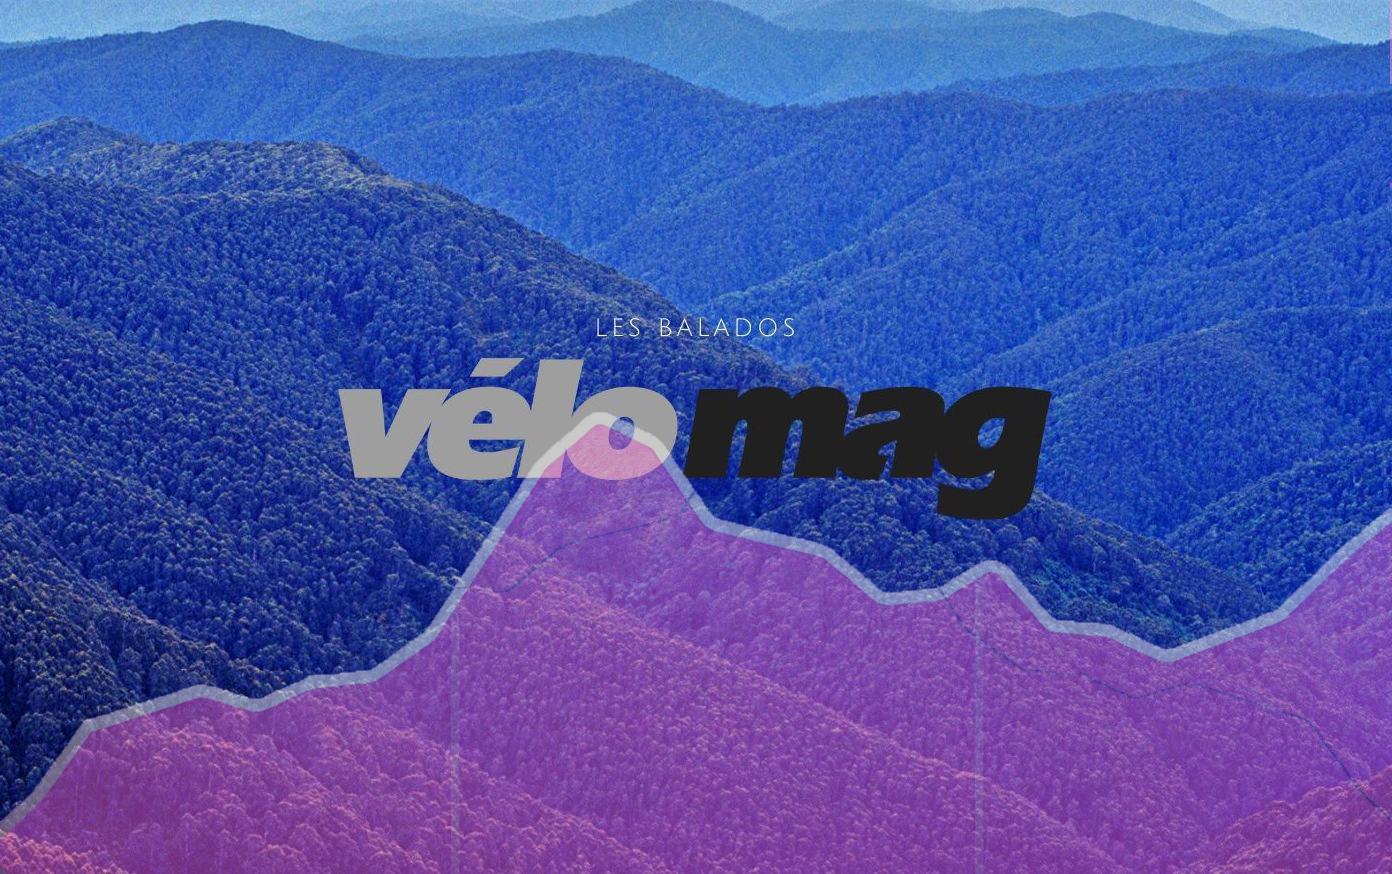 velo-mag balado cover site web MTURGEON